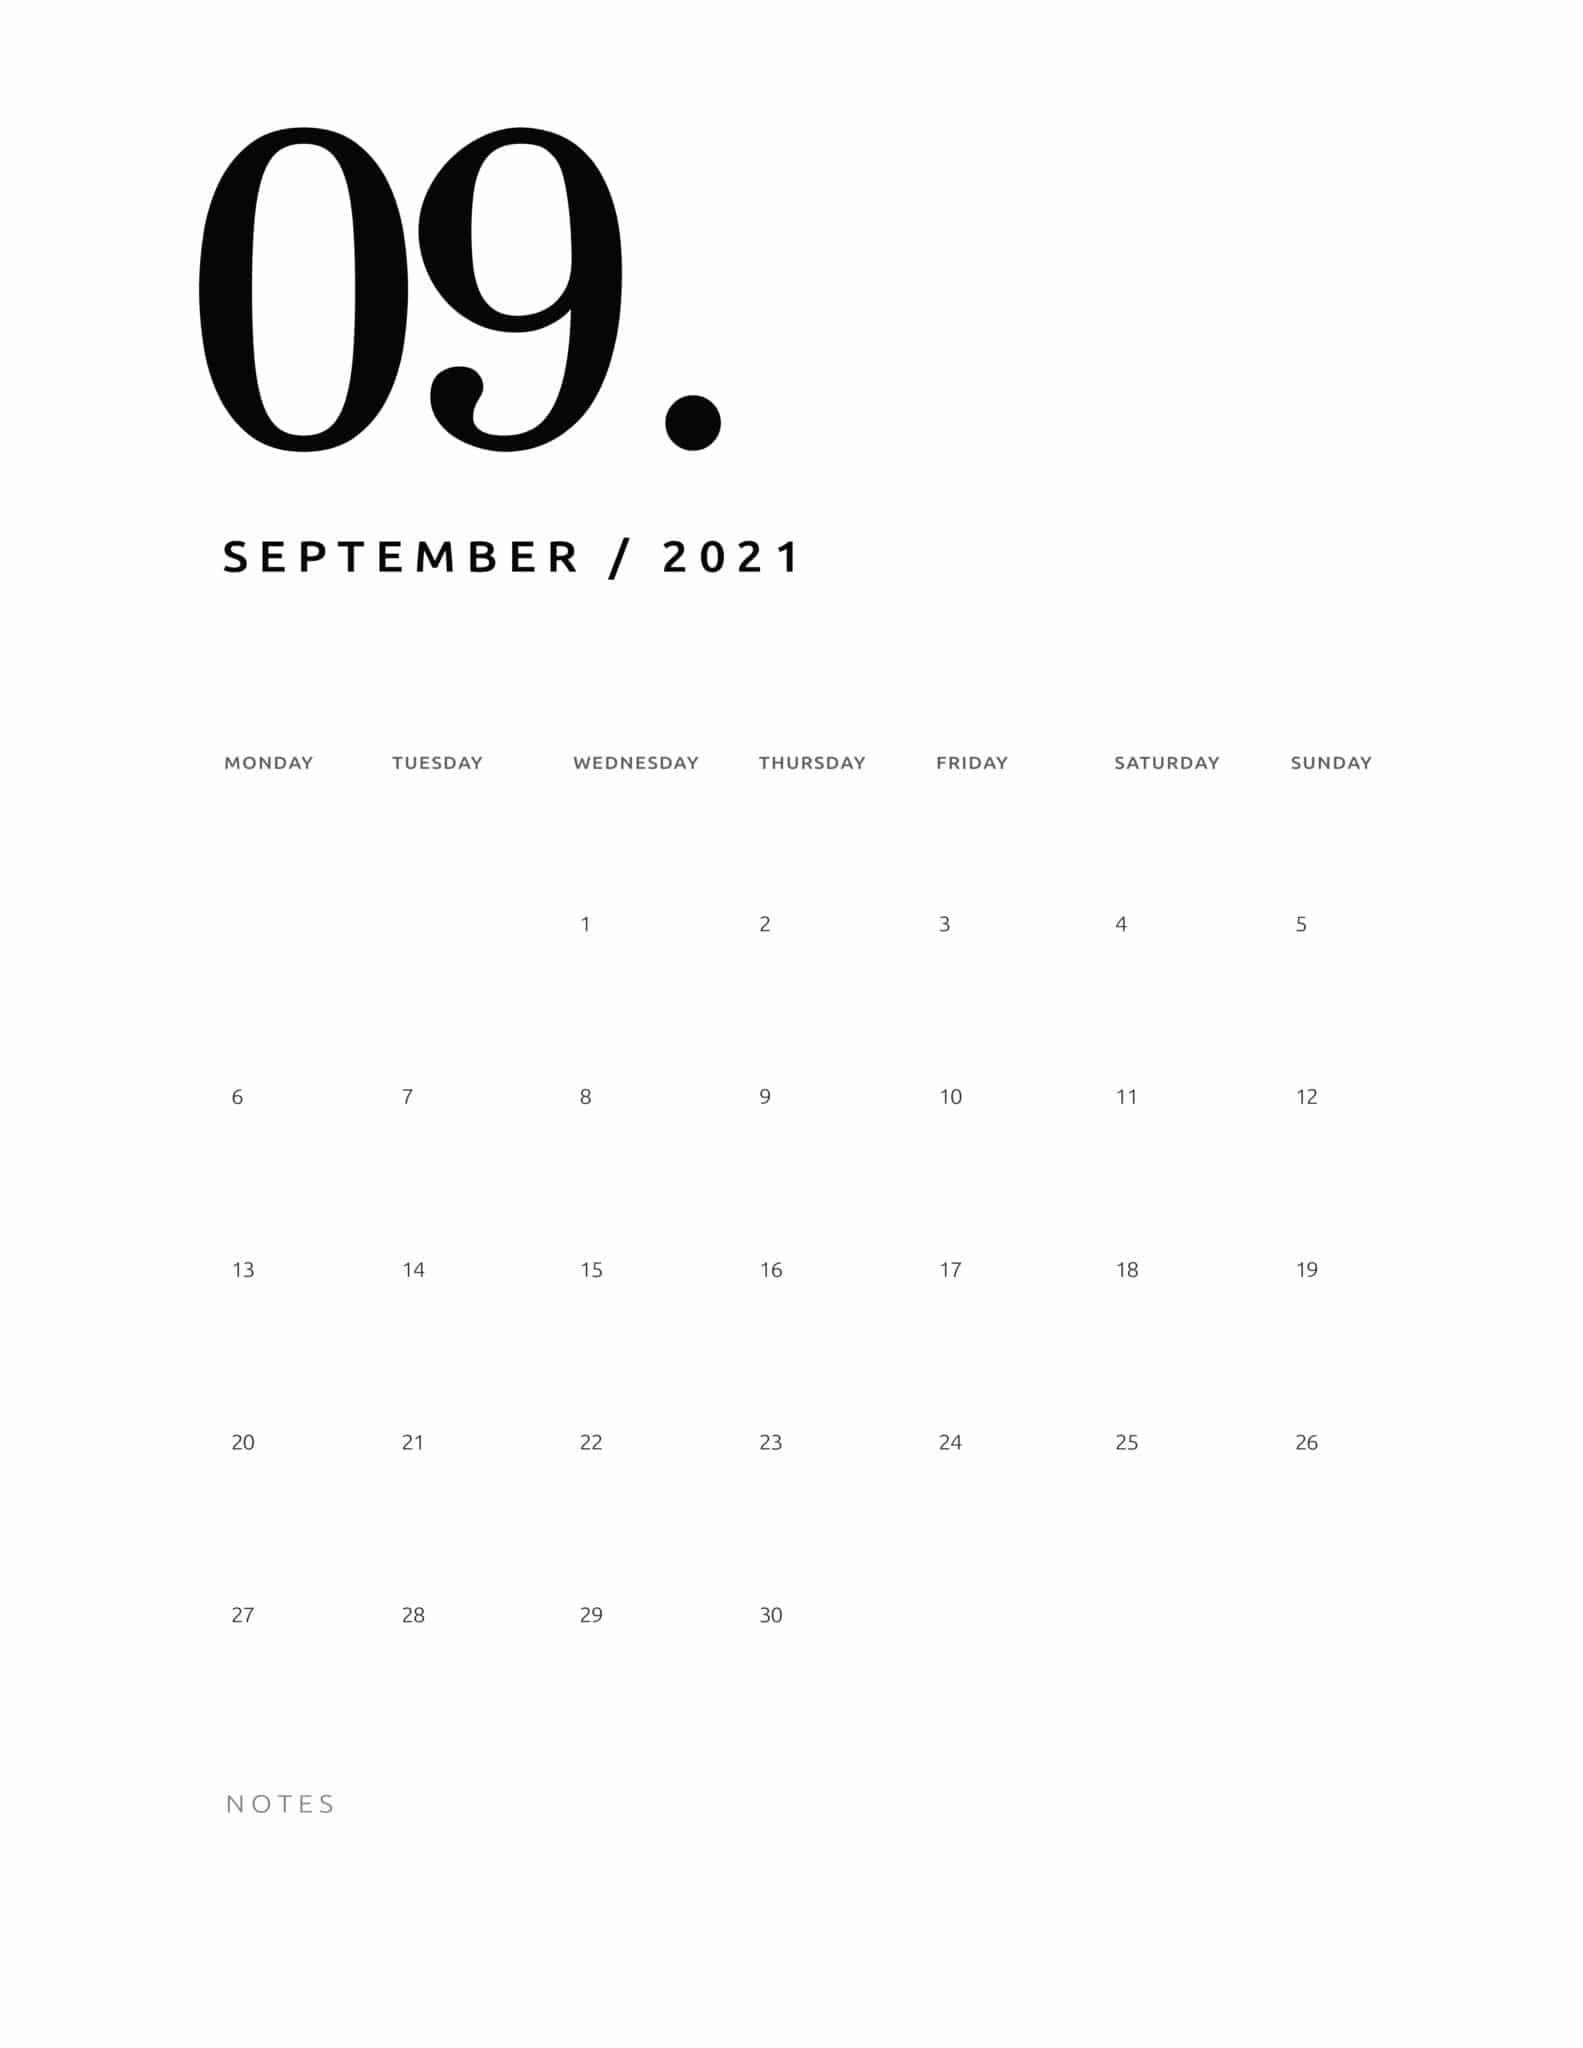 2021 Calendar, Print Calendar, Blank Monthly Calendar Template